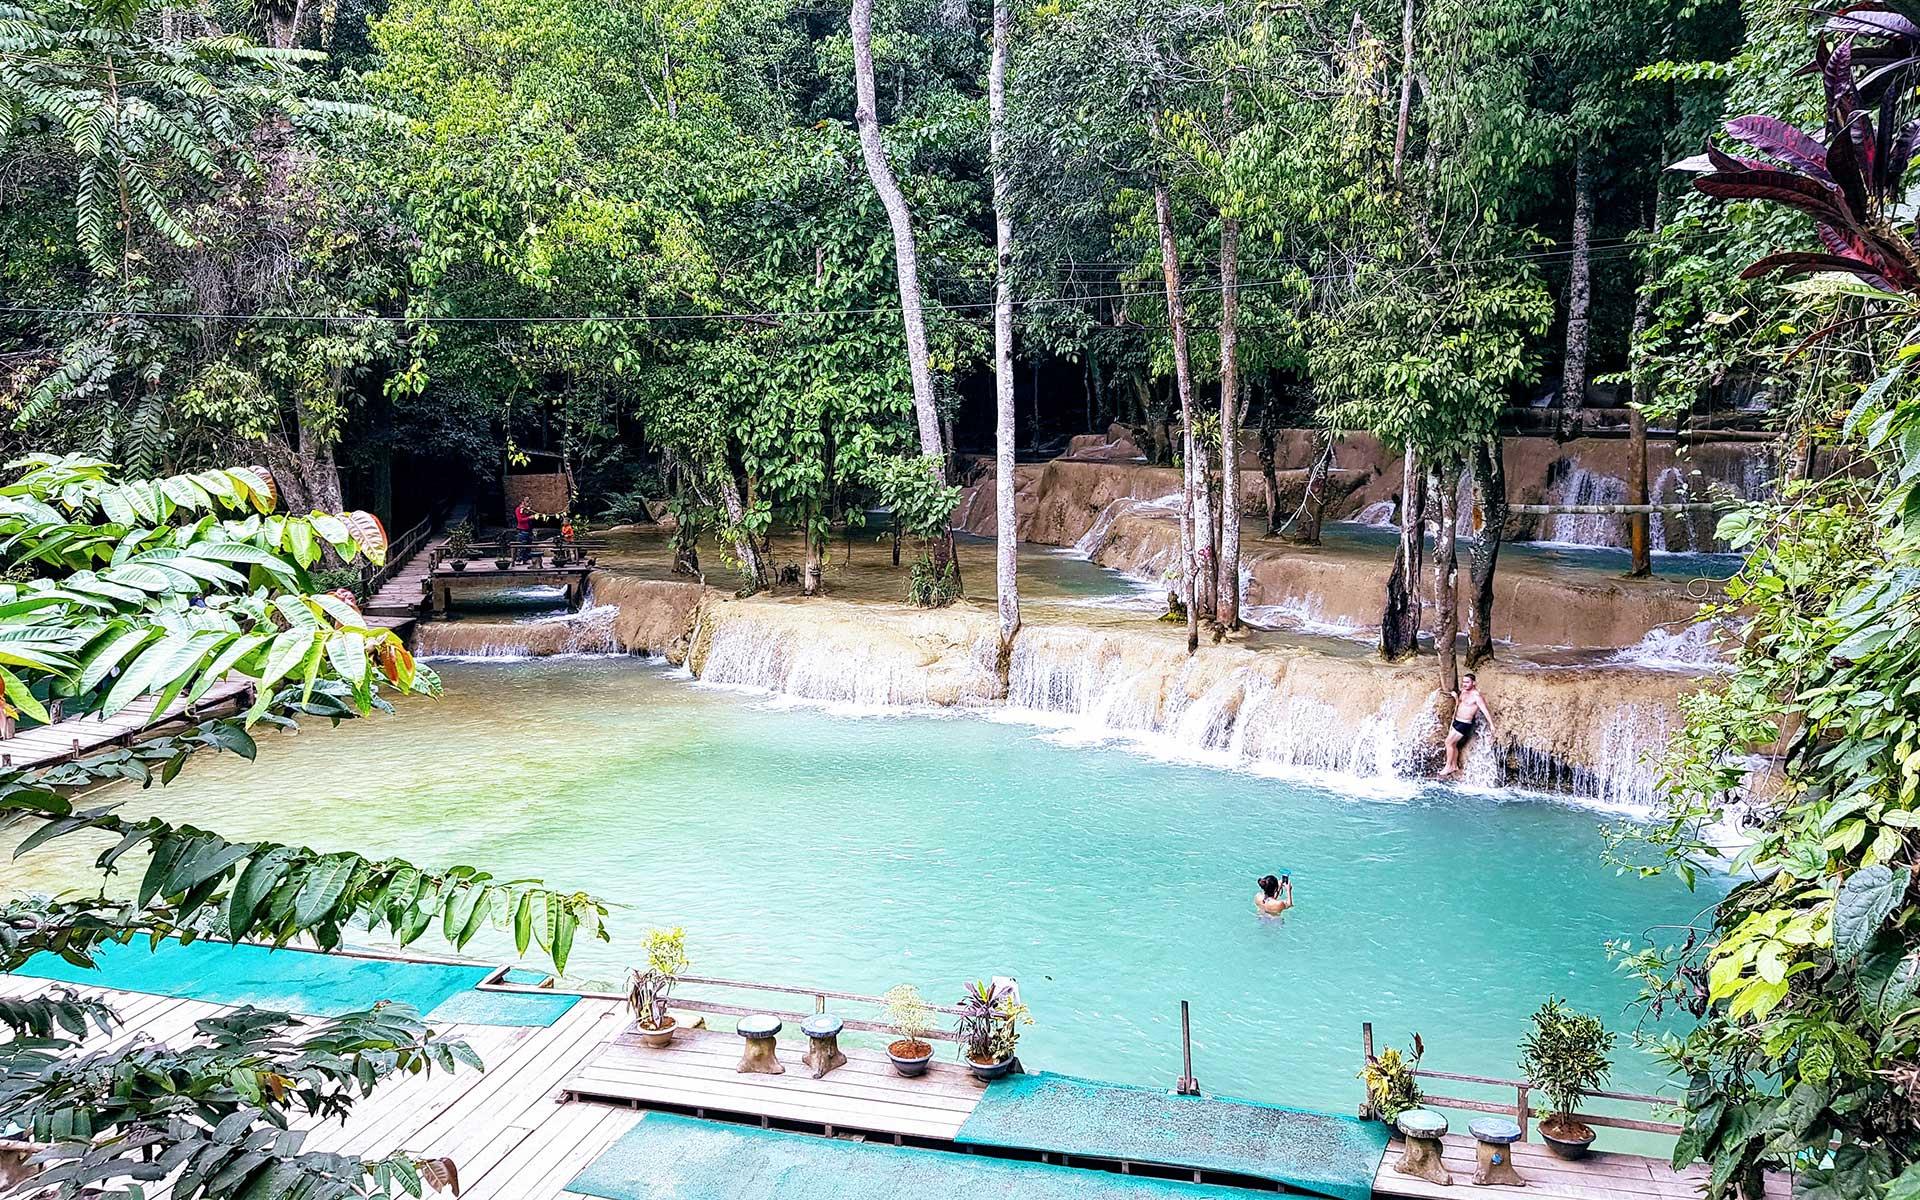 Tad Sae Waterfall Luang Prabang 1 Laos Travel